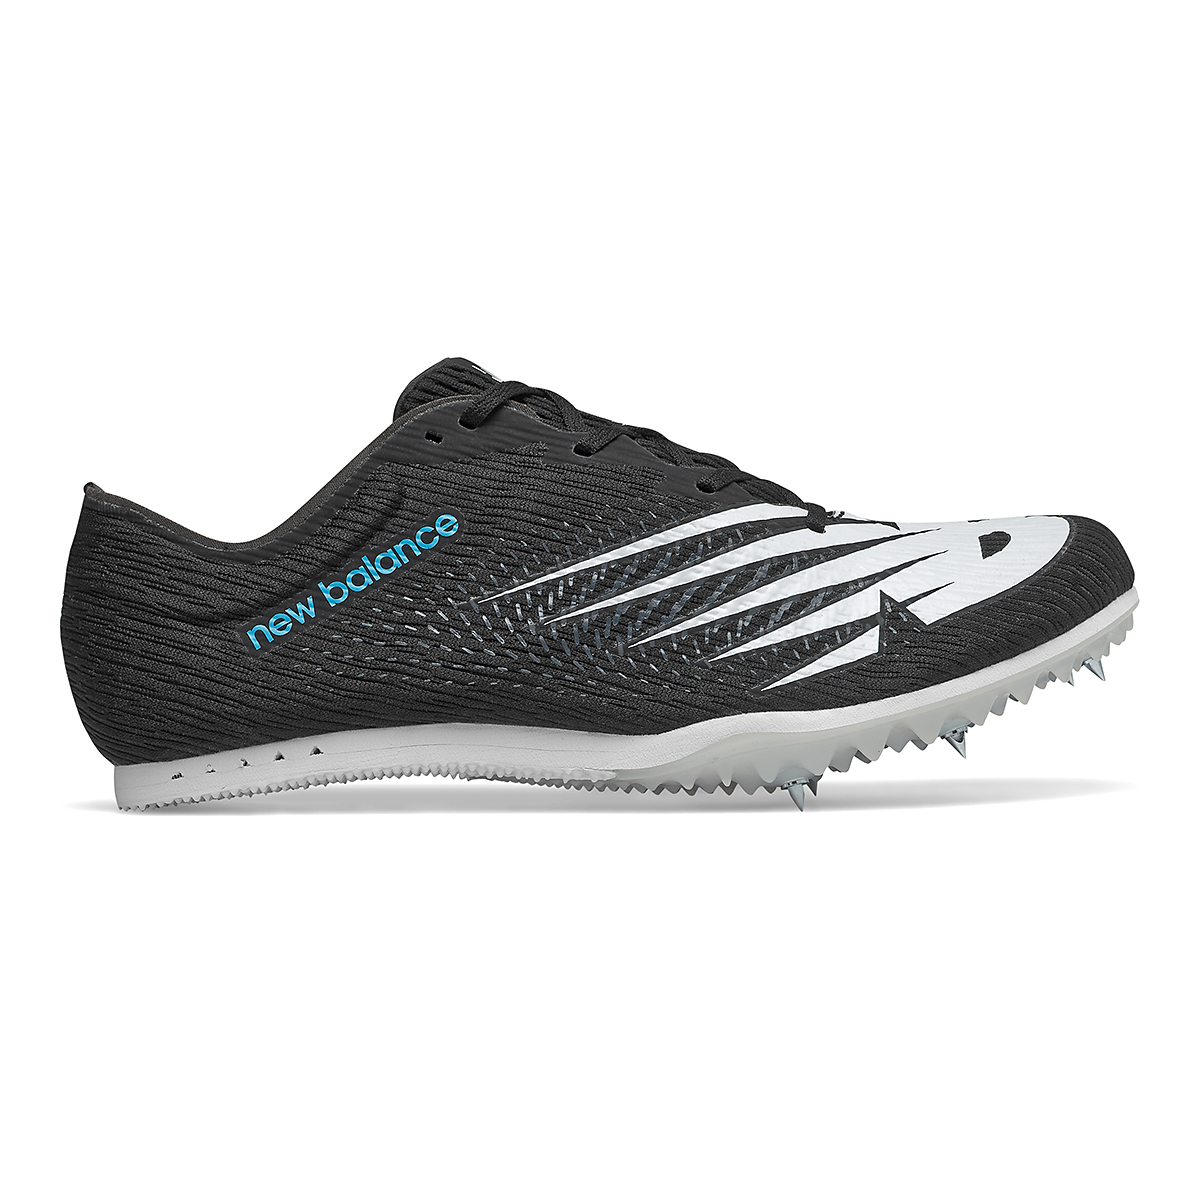 Men's New Balance MD500v7 Track Spikes - Color: Black/White - Size: 6.5 - Width: Regular, Black/White, large, image 1